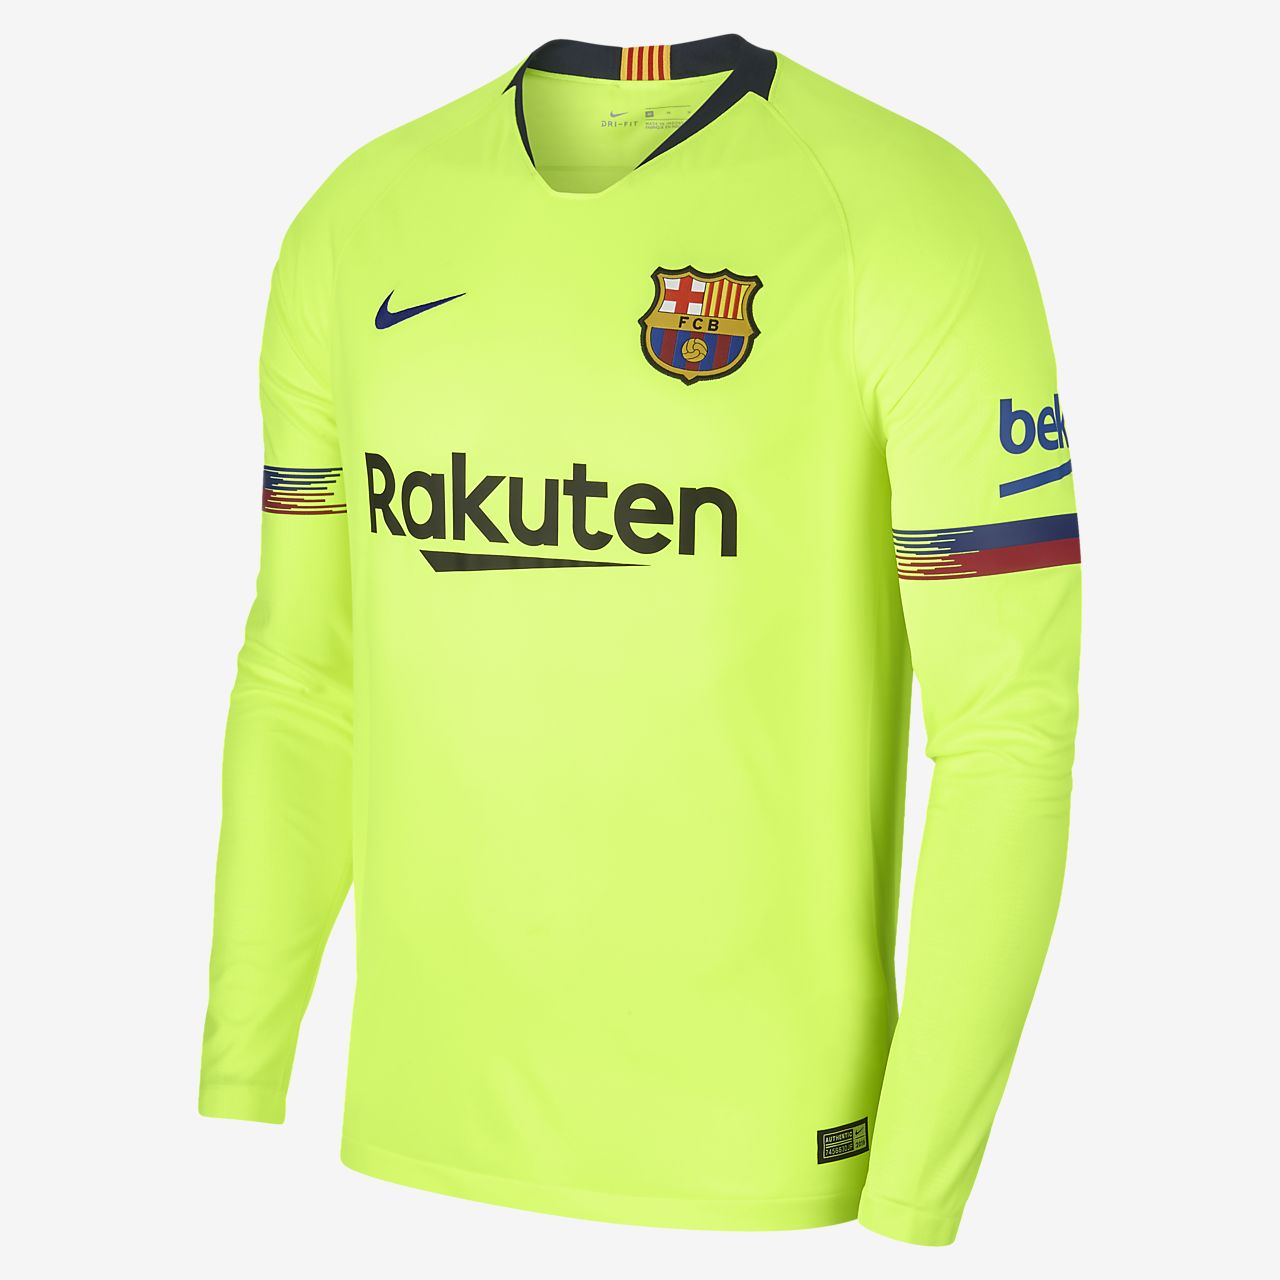 2018 19 FC Barcelona Stadium Away Camiseta de fútbol de manga larga - Hombre d6b9578cb26